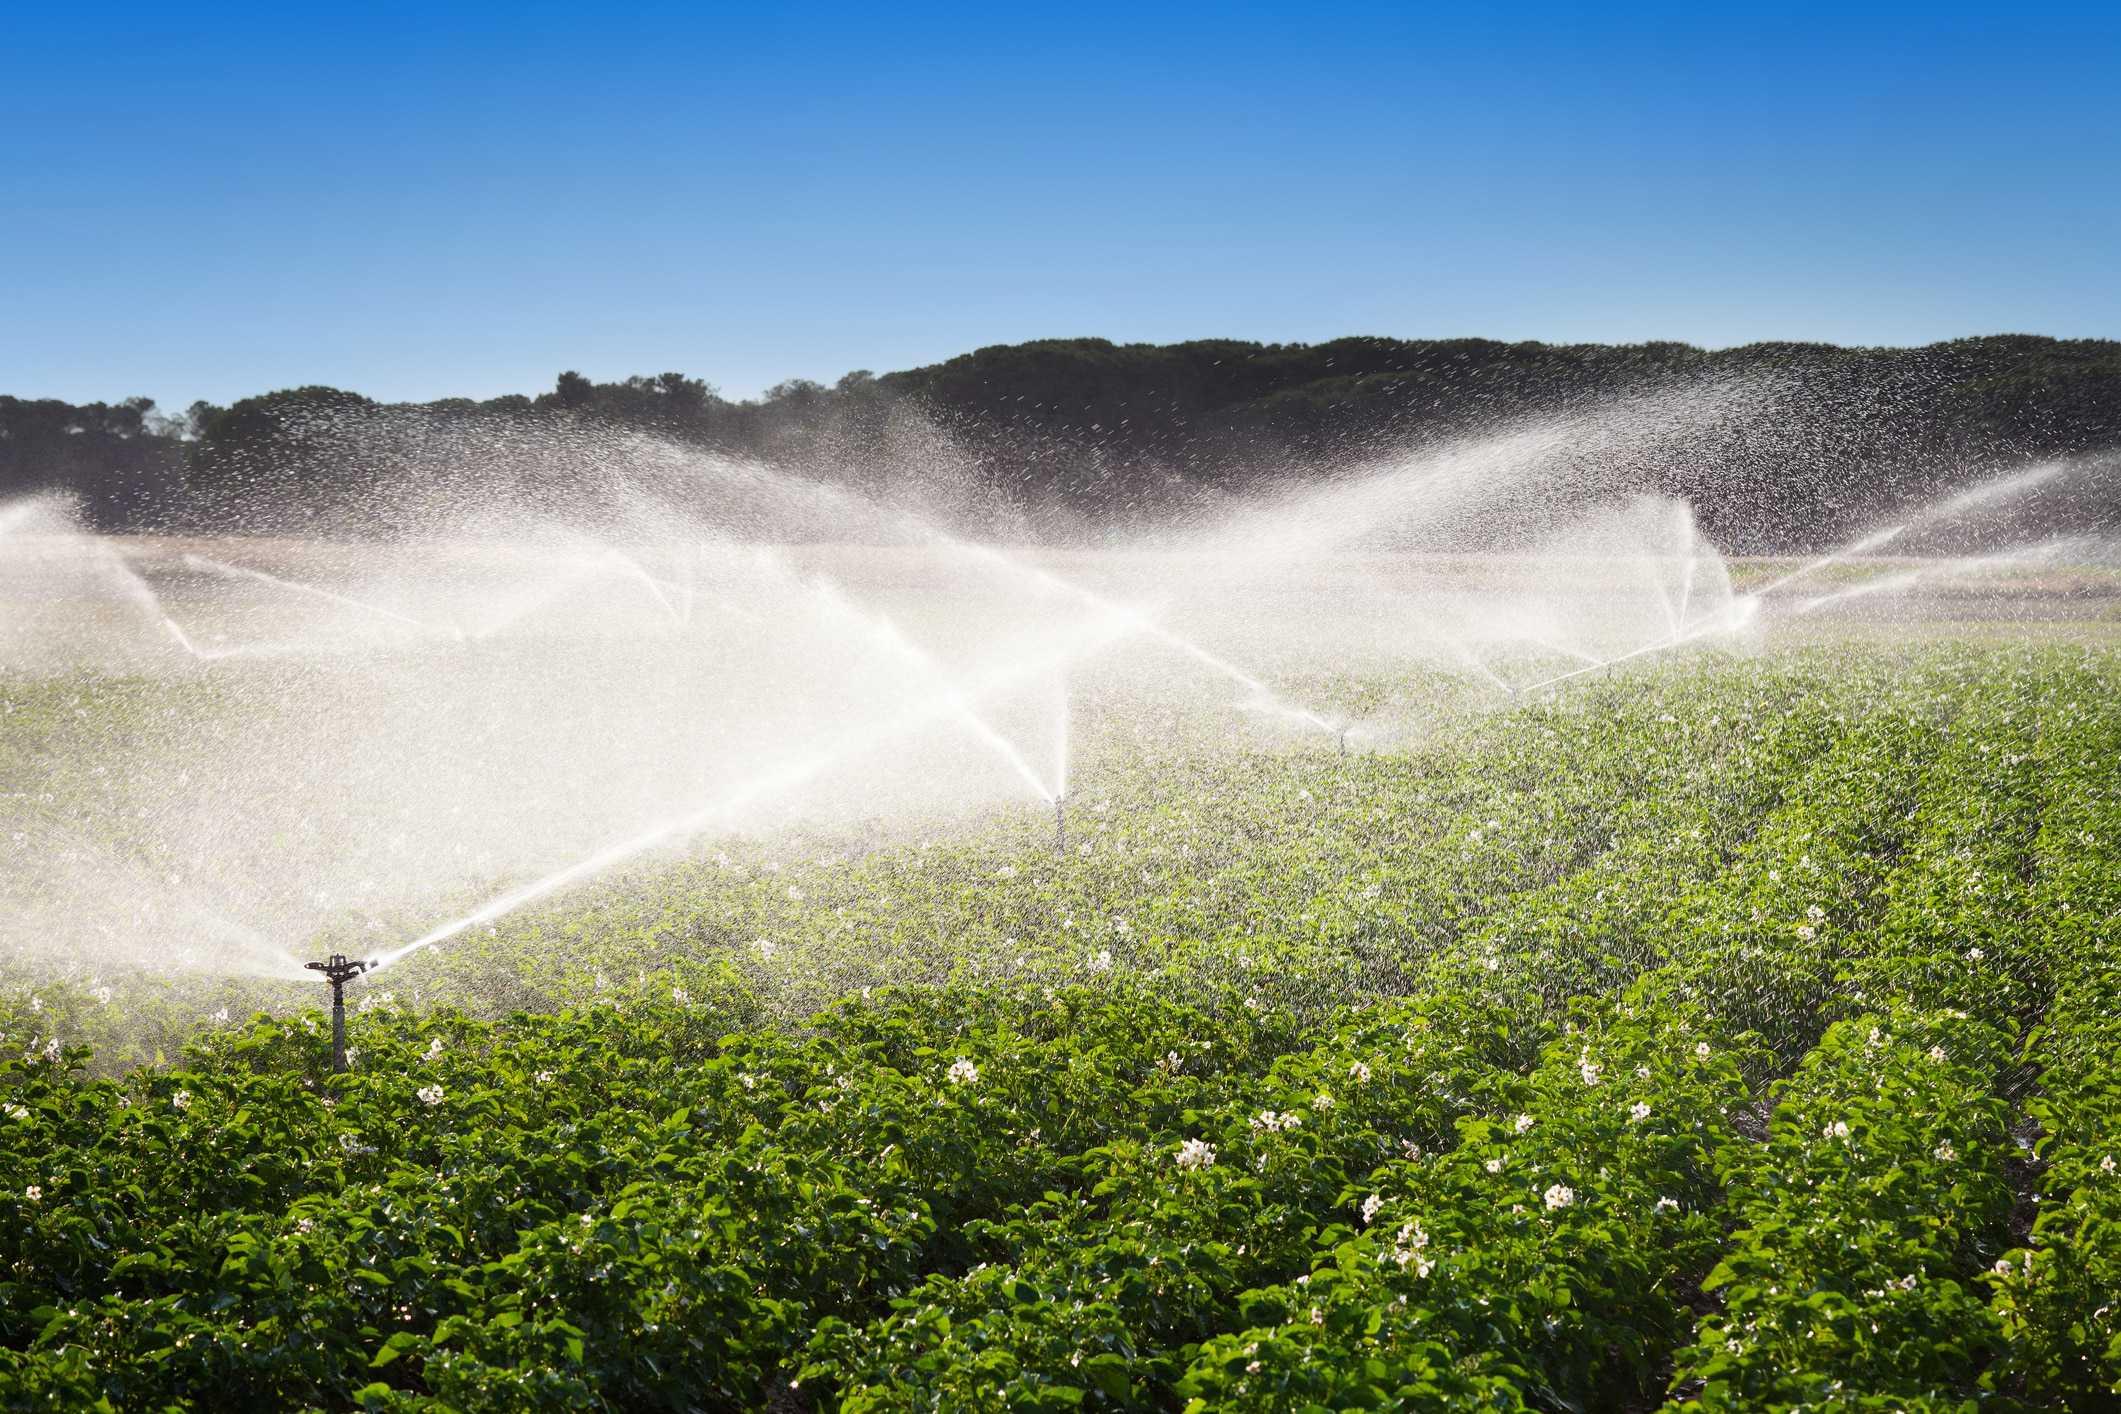 Saudi Arabian water scarcity key focus of new report